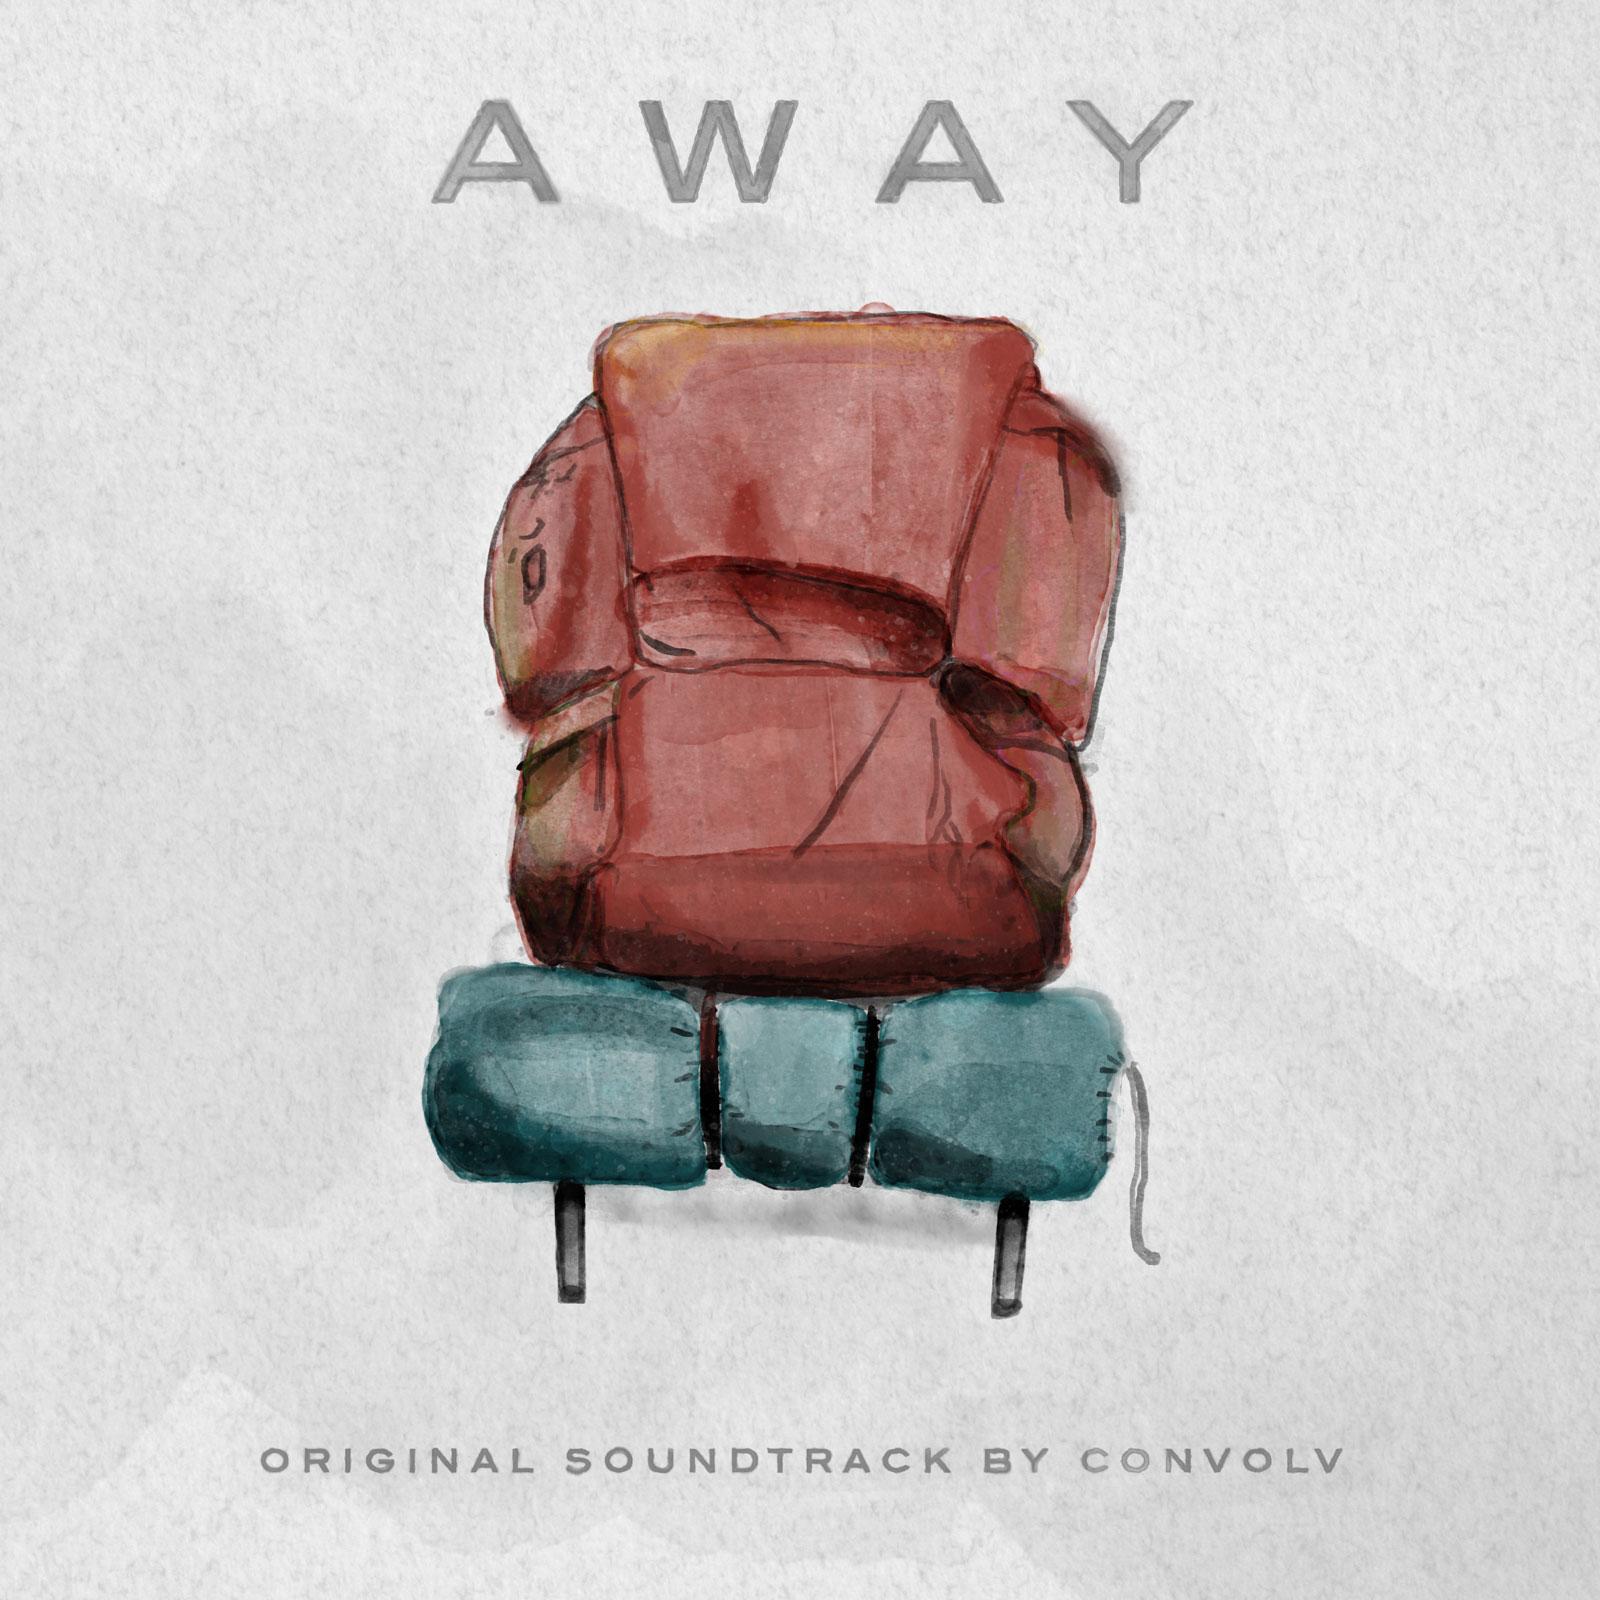 Away-Album-Art.jpg